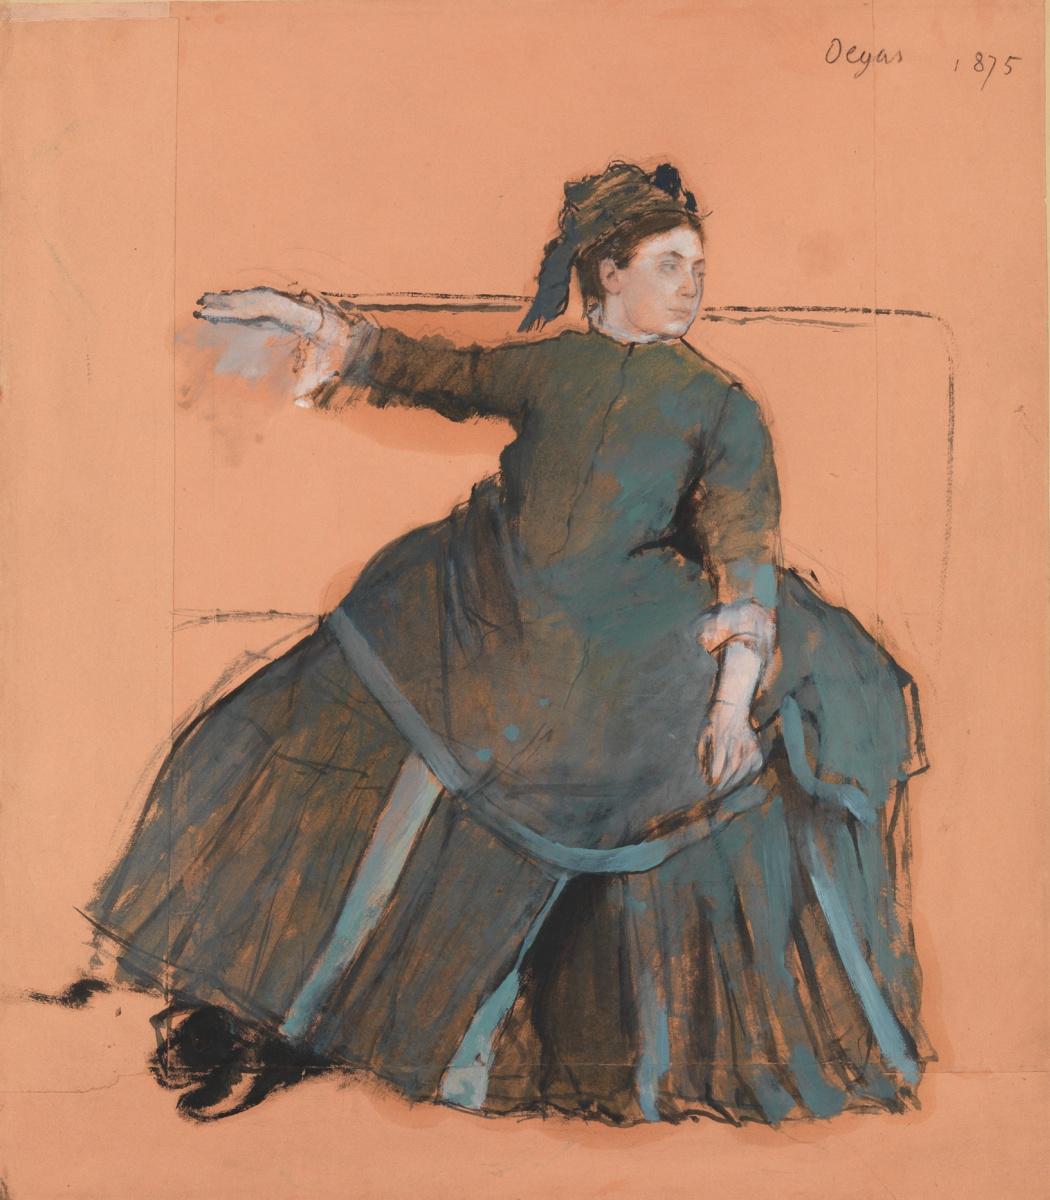 Edgar Degas. The woman on the sofa